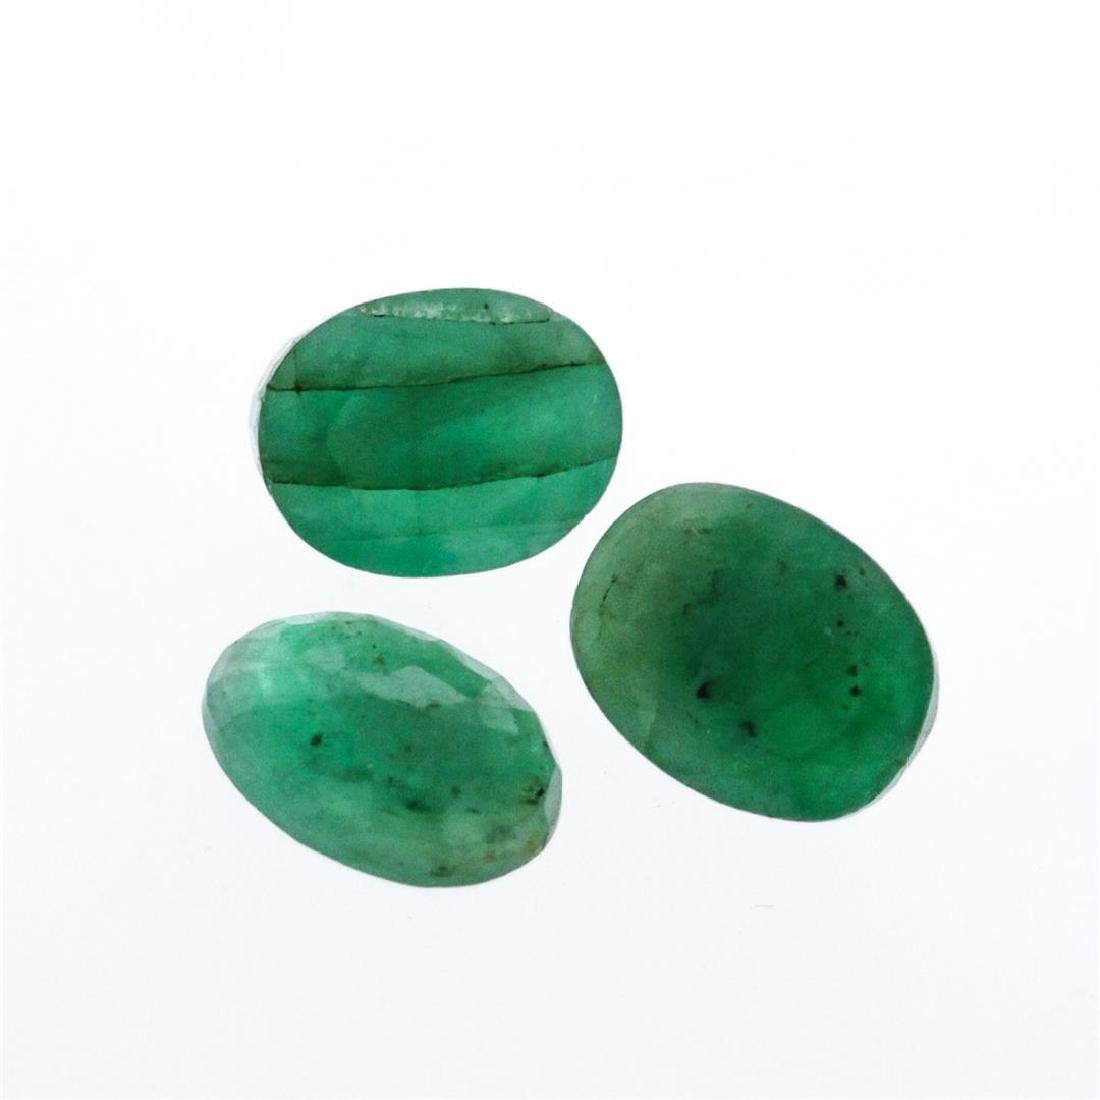 4.45 cts. Oval Cut Natural Emerald Parcel